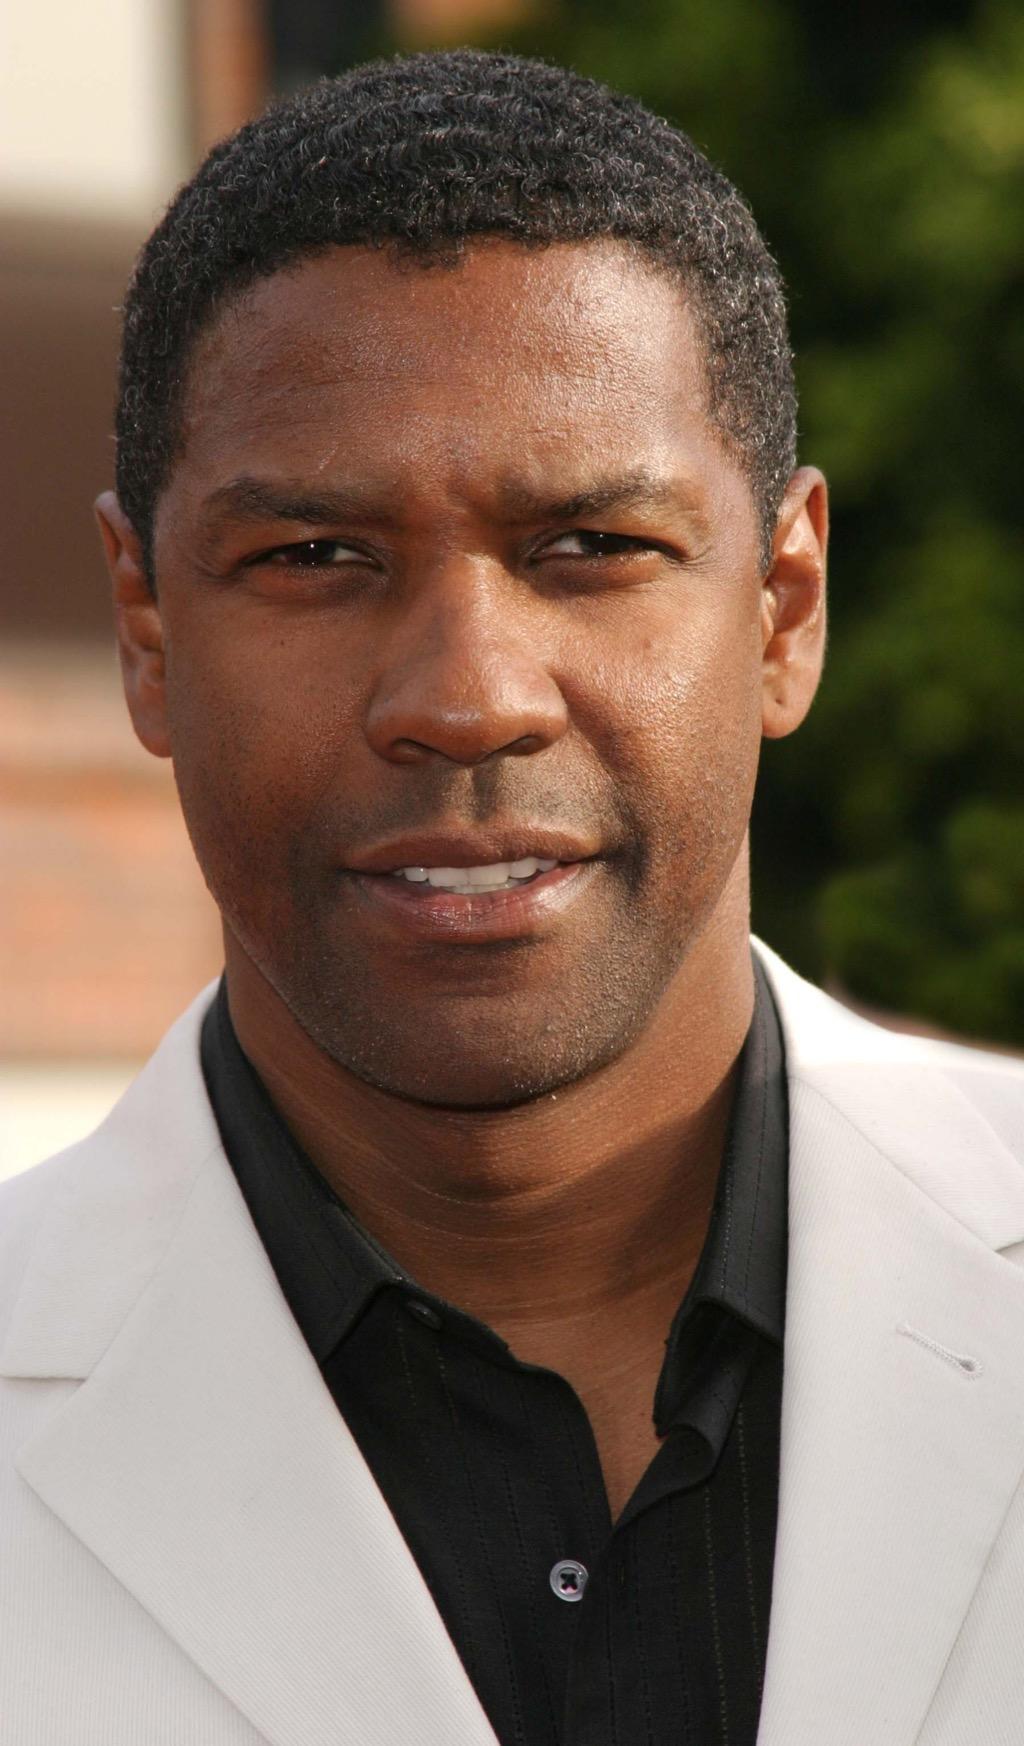 Denzel Washington Interviews That Ruined Celebrities Careers